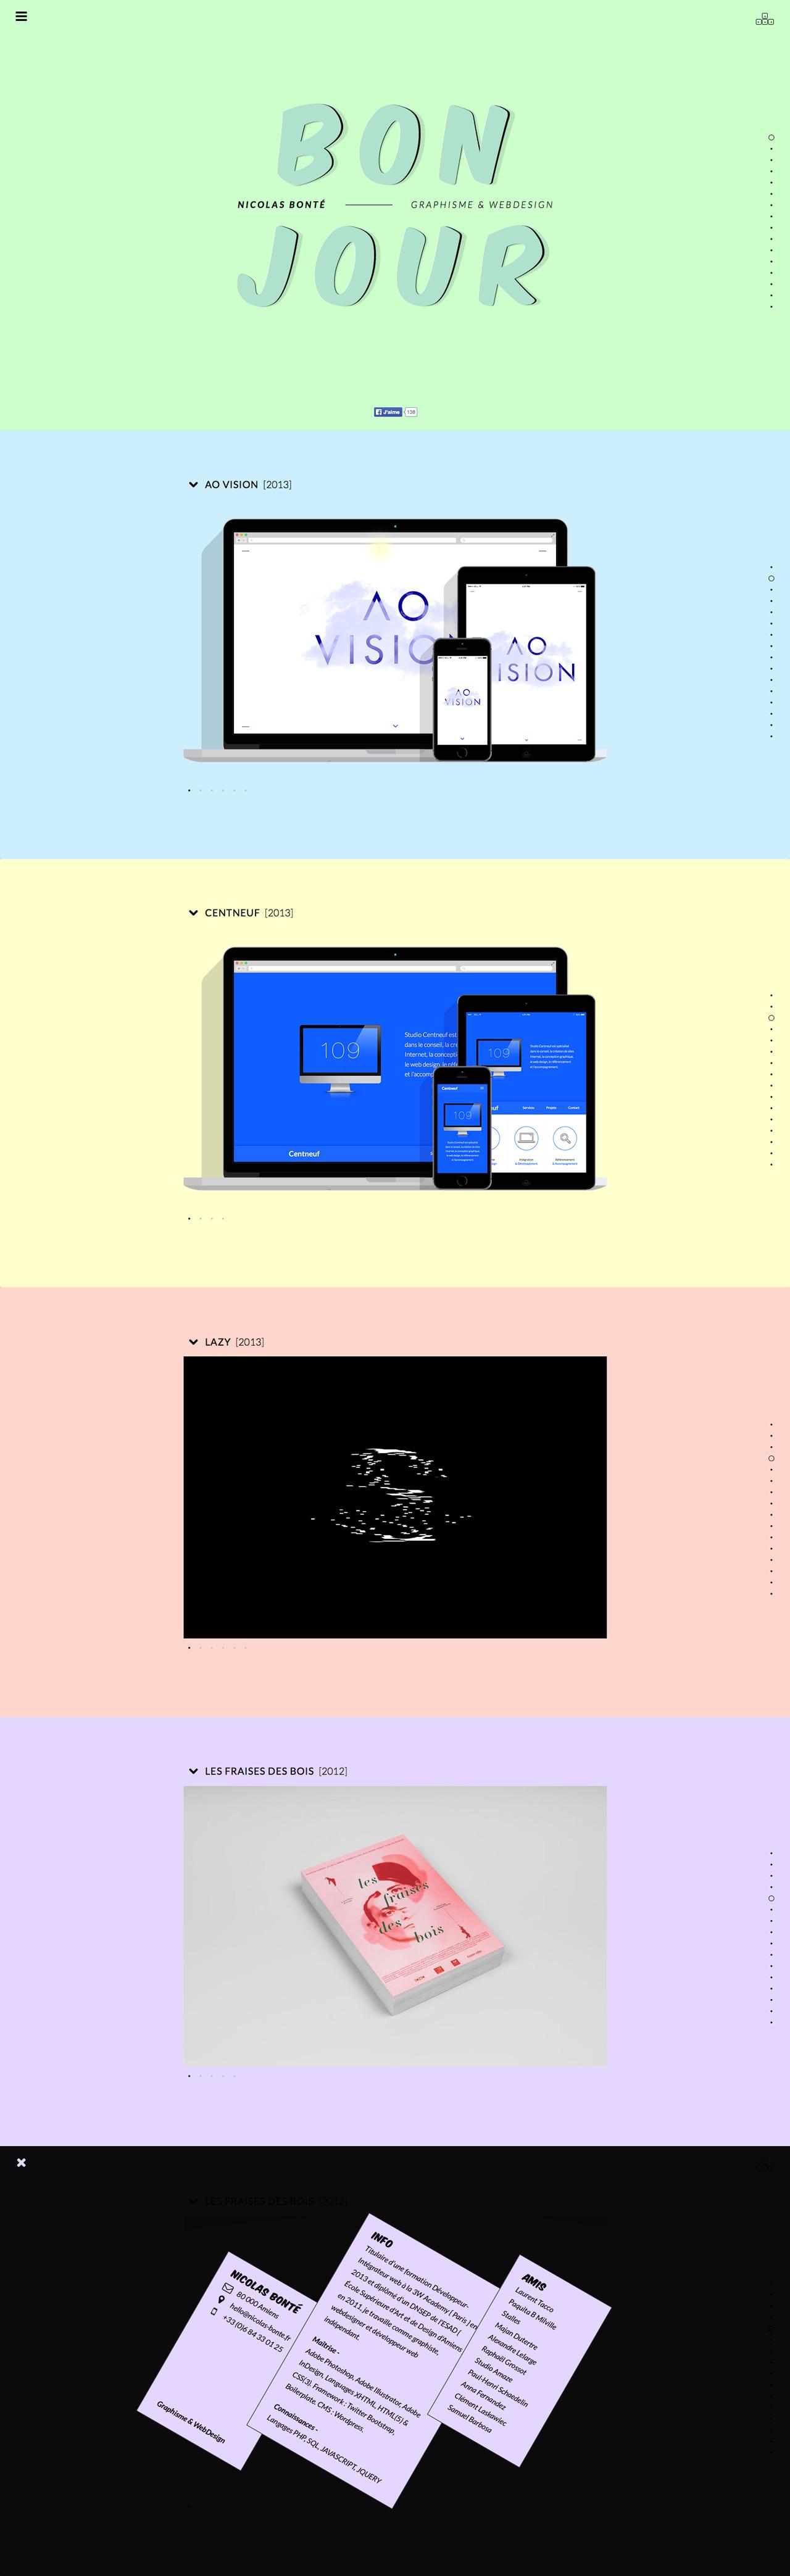 Nicolas Bonté Website Screenshot